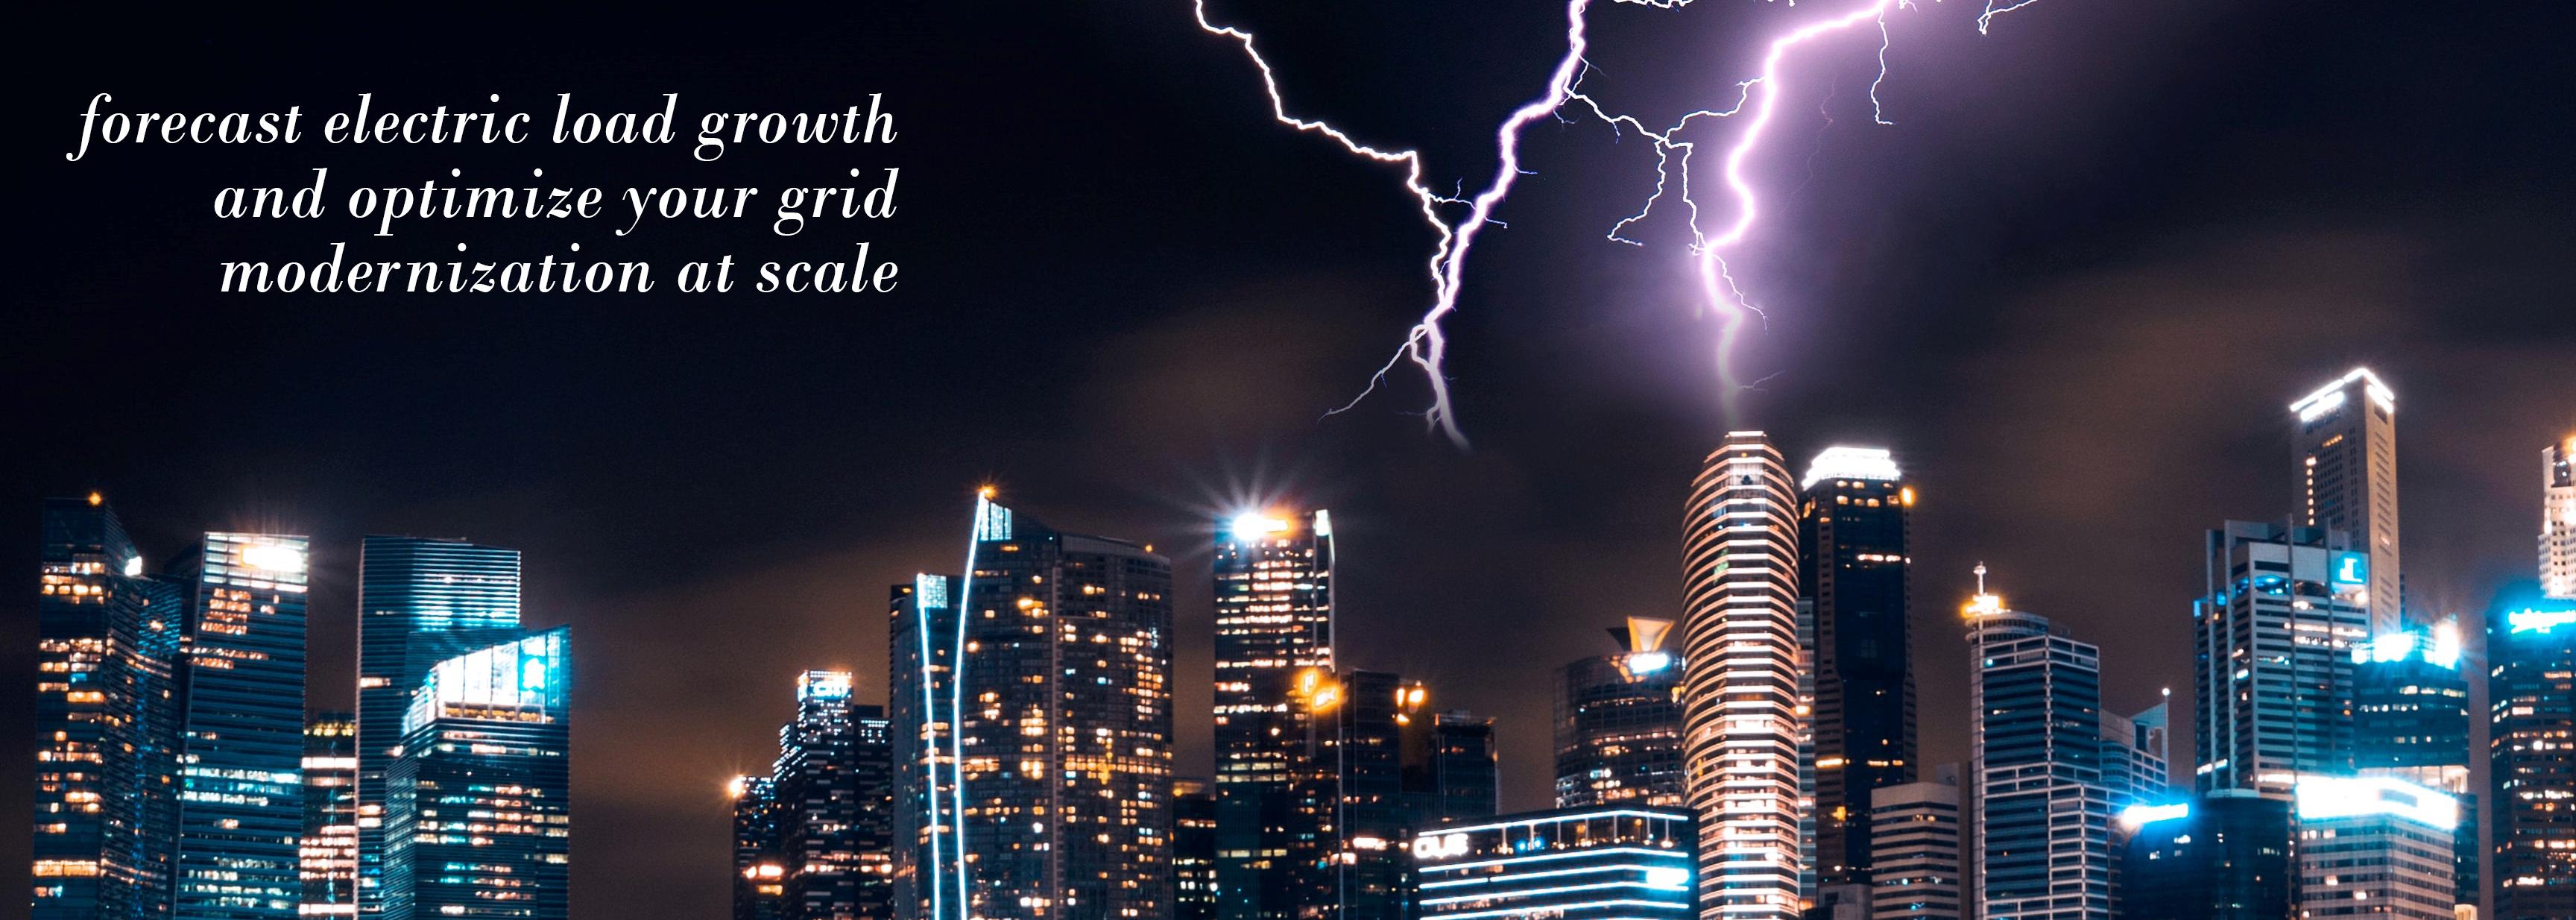 Corios Lightning hero image